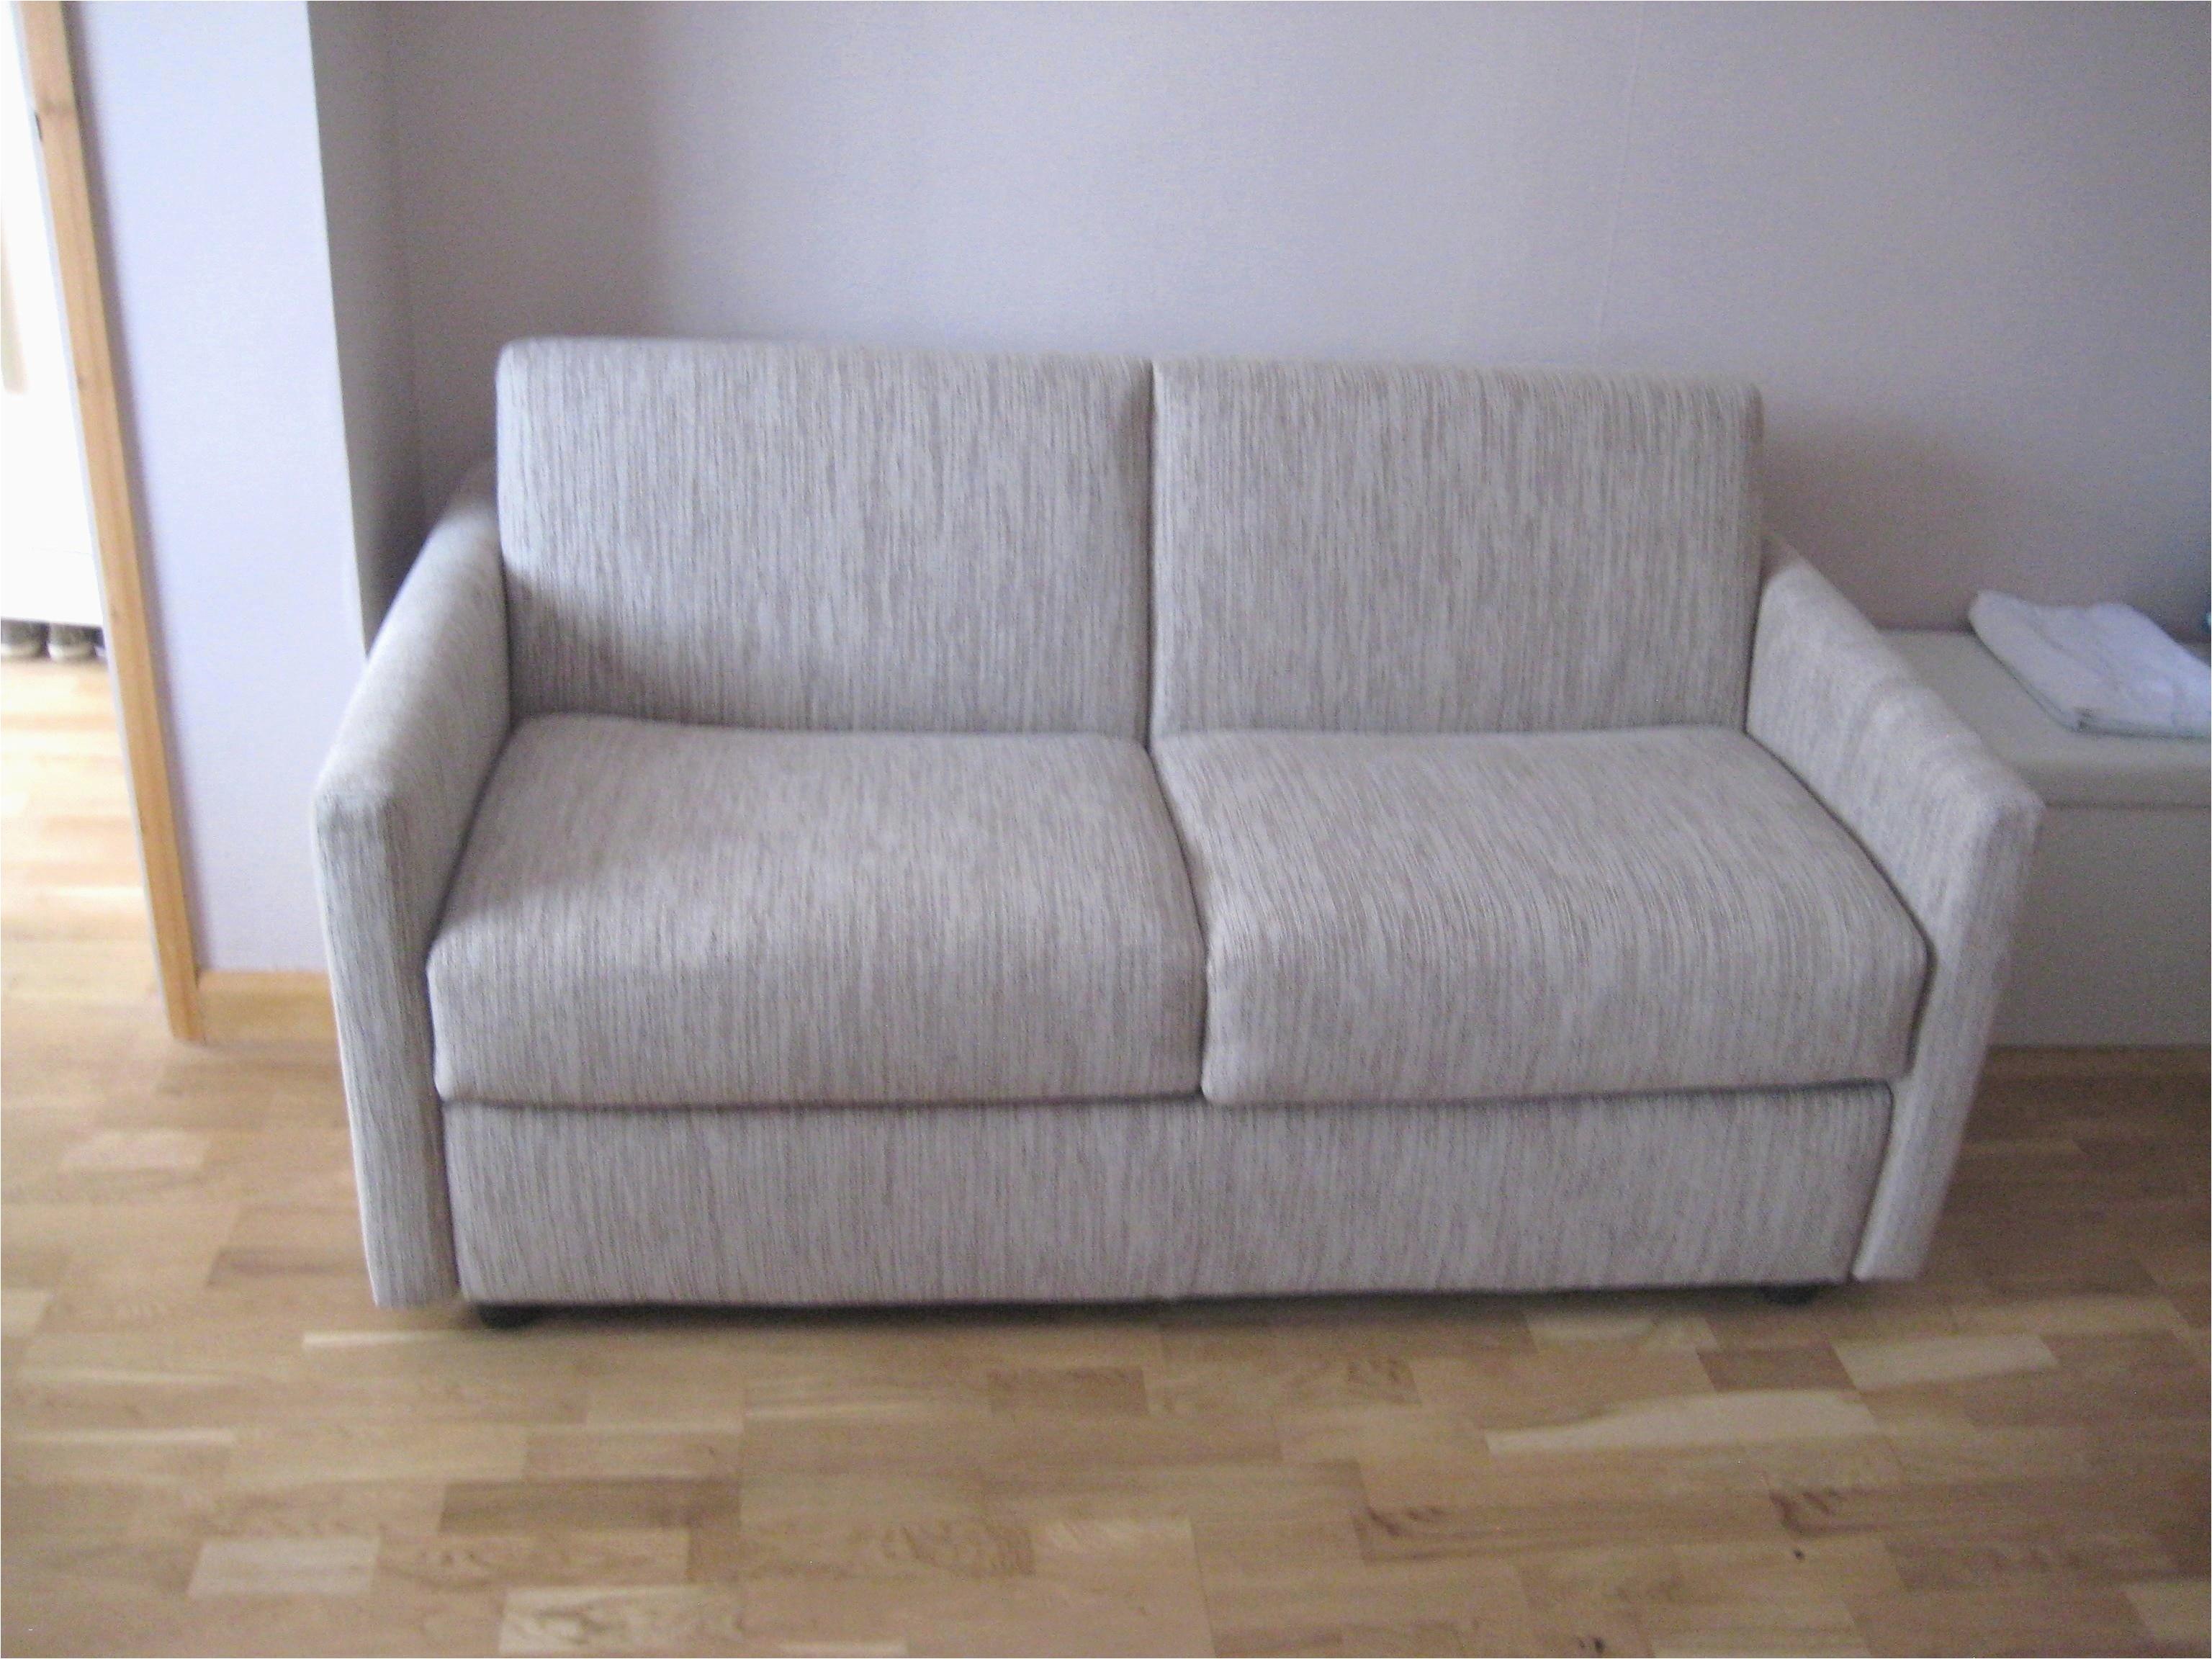 Solsta sofa Bed Ikea Review Ikea Schlafsofa solsta Inspirierend 26 Lovely solsta Sleeper sofa